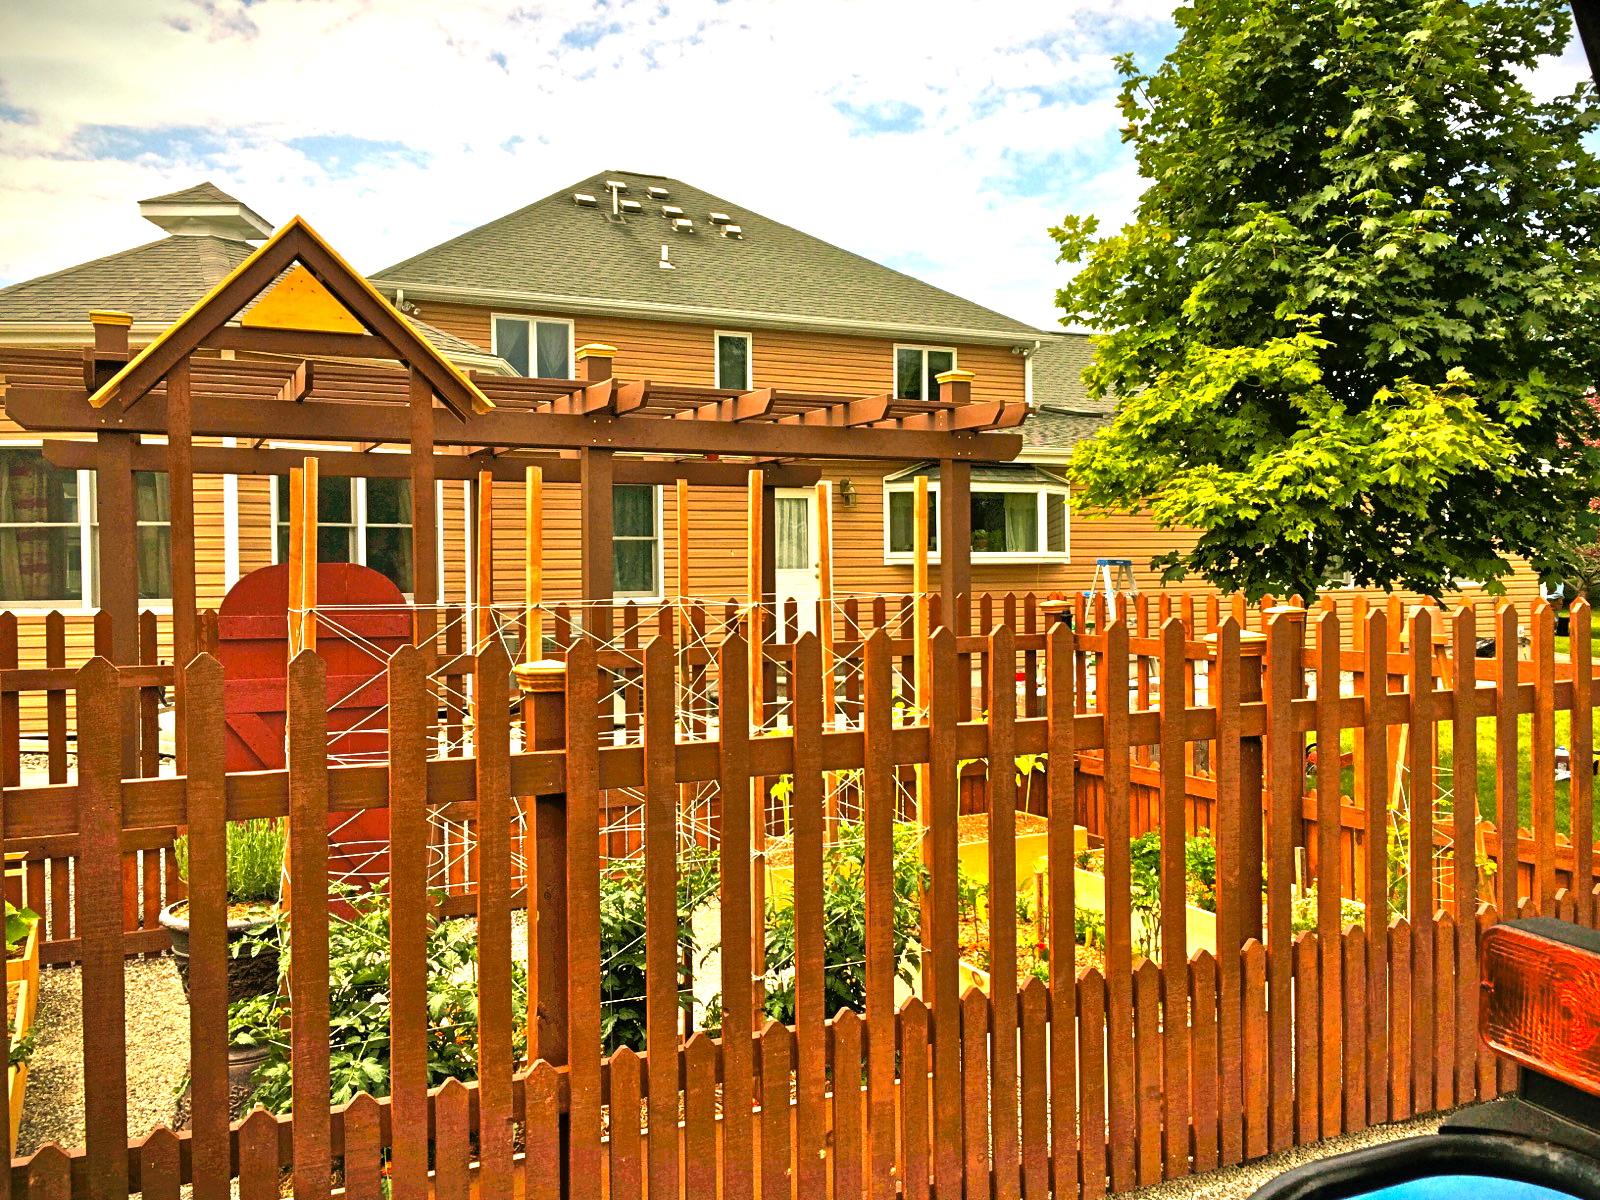 Garden Fence & setting